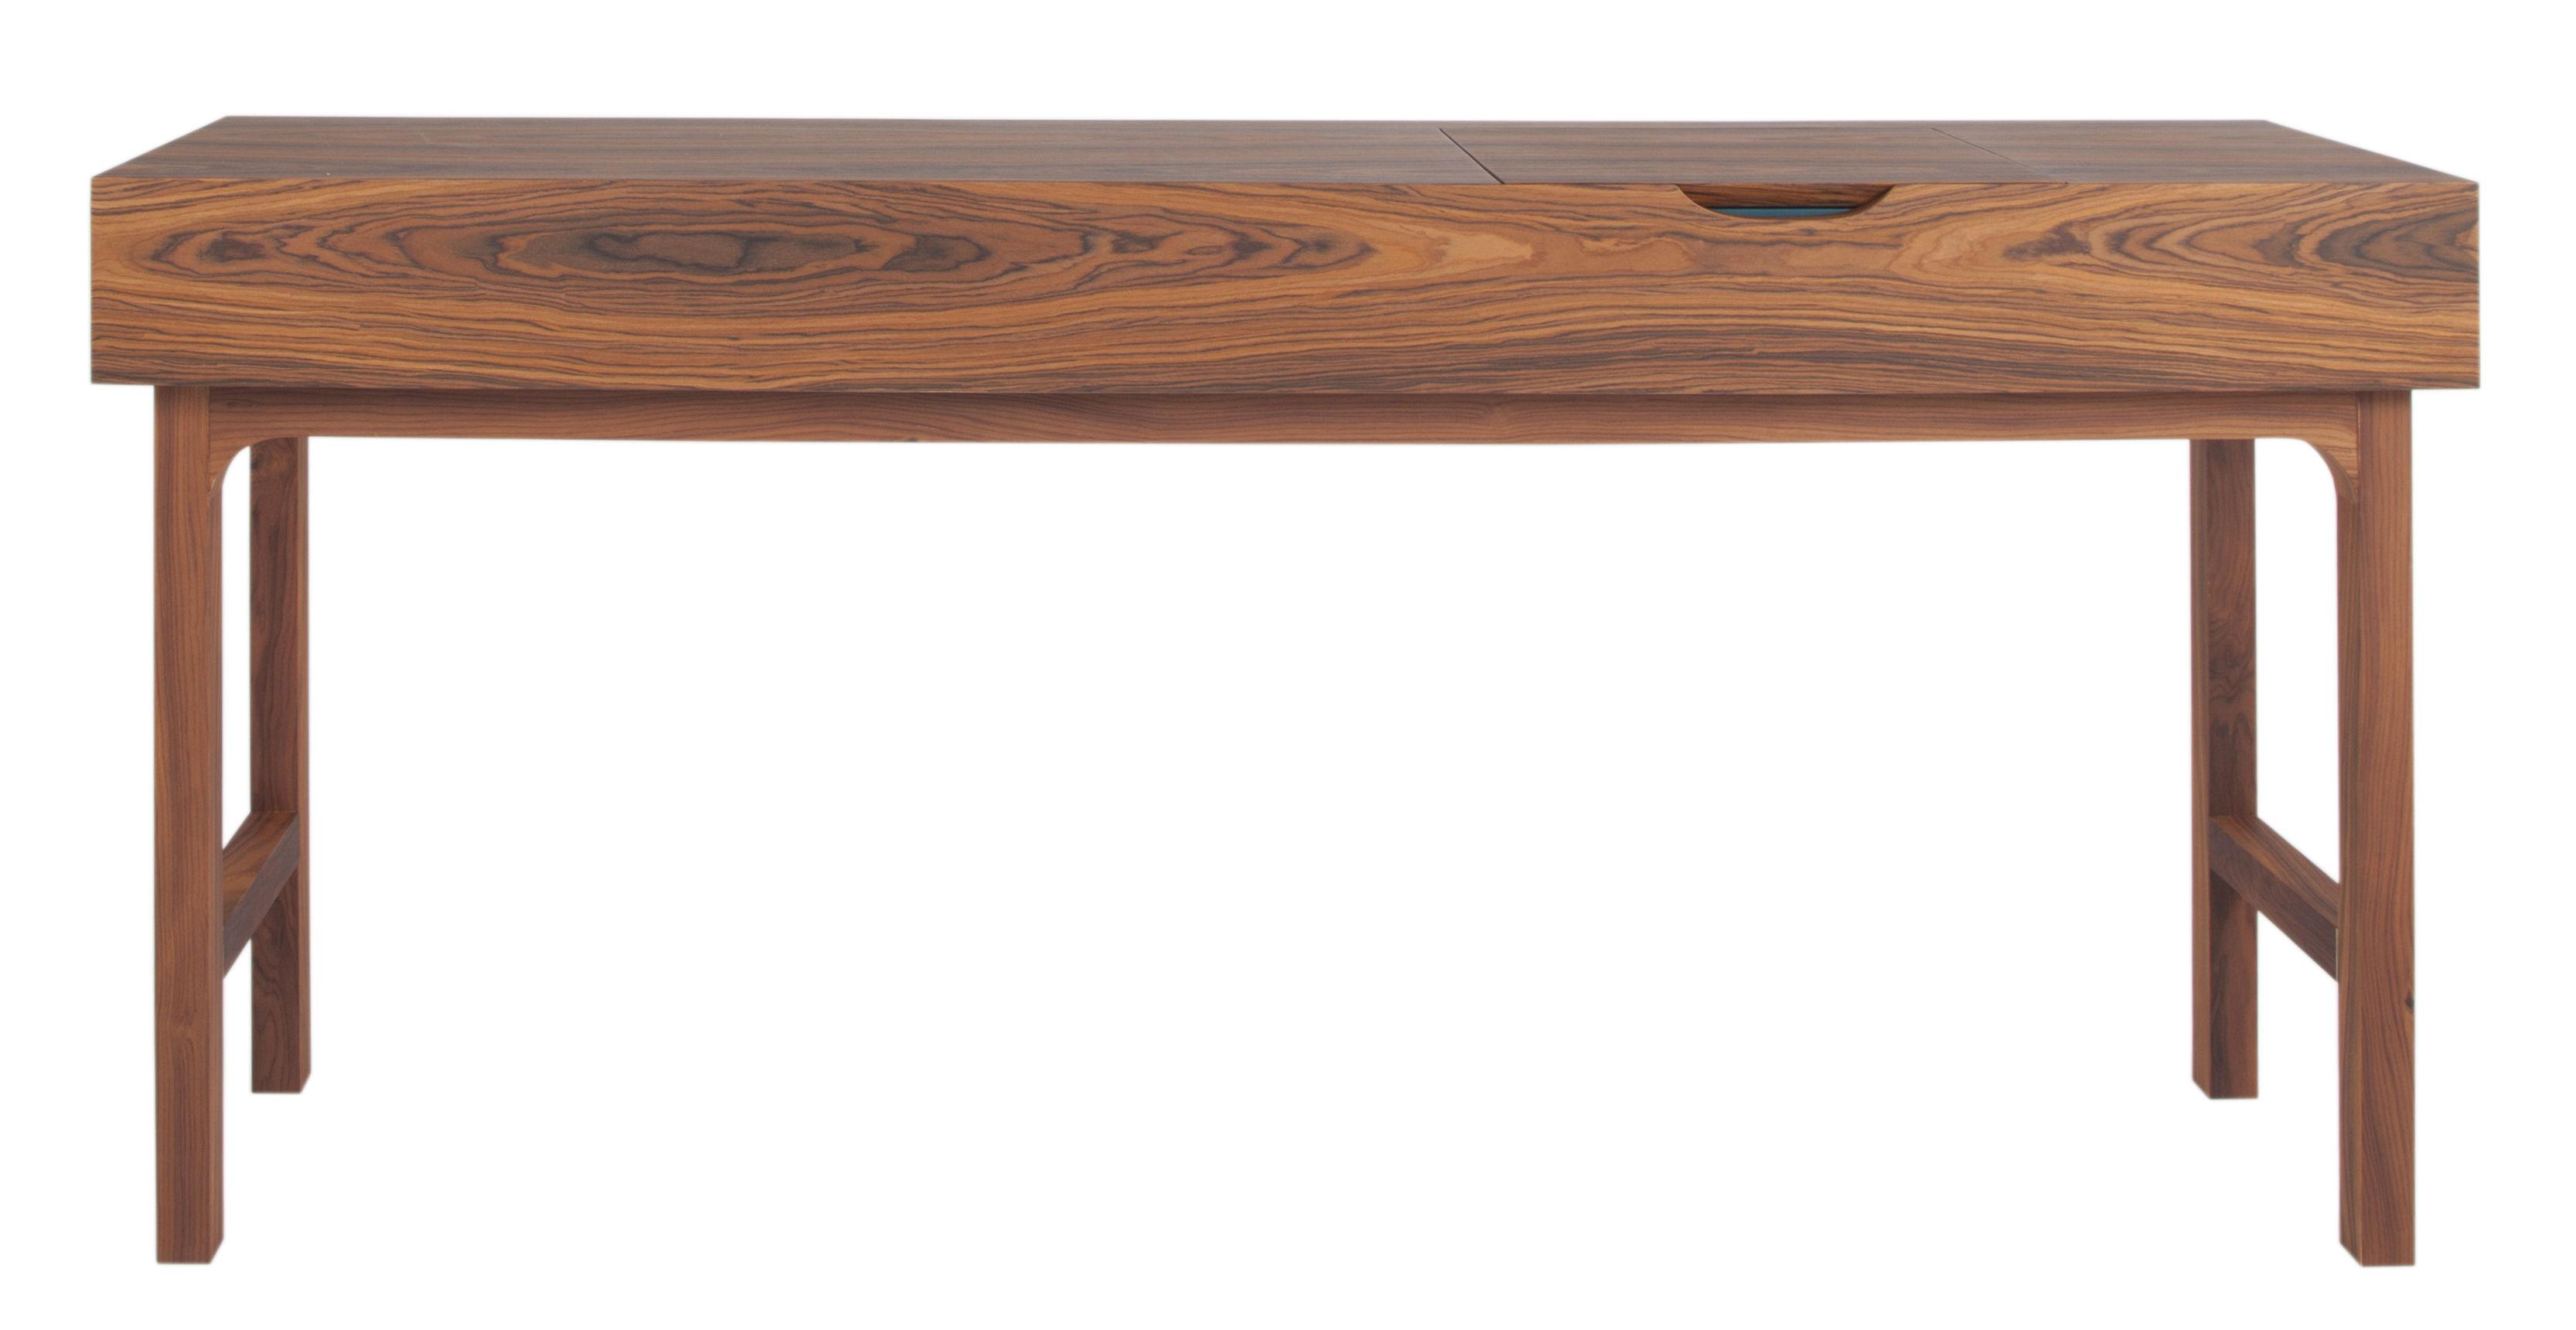 Möbel - Konsole - Le Roch Konsole / Frisiertischchen - Palisander - L 170 cm - Maison Sarah Lavoine - Palisander / Staufach blau - Placage palissandre